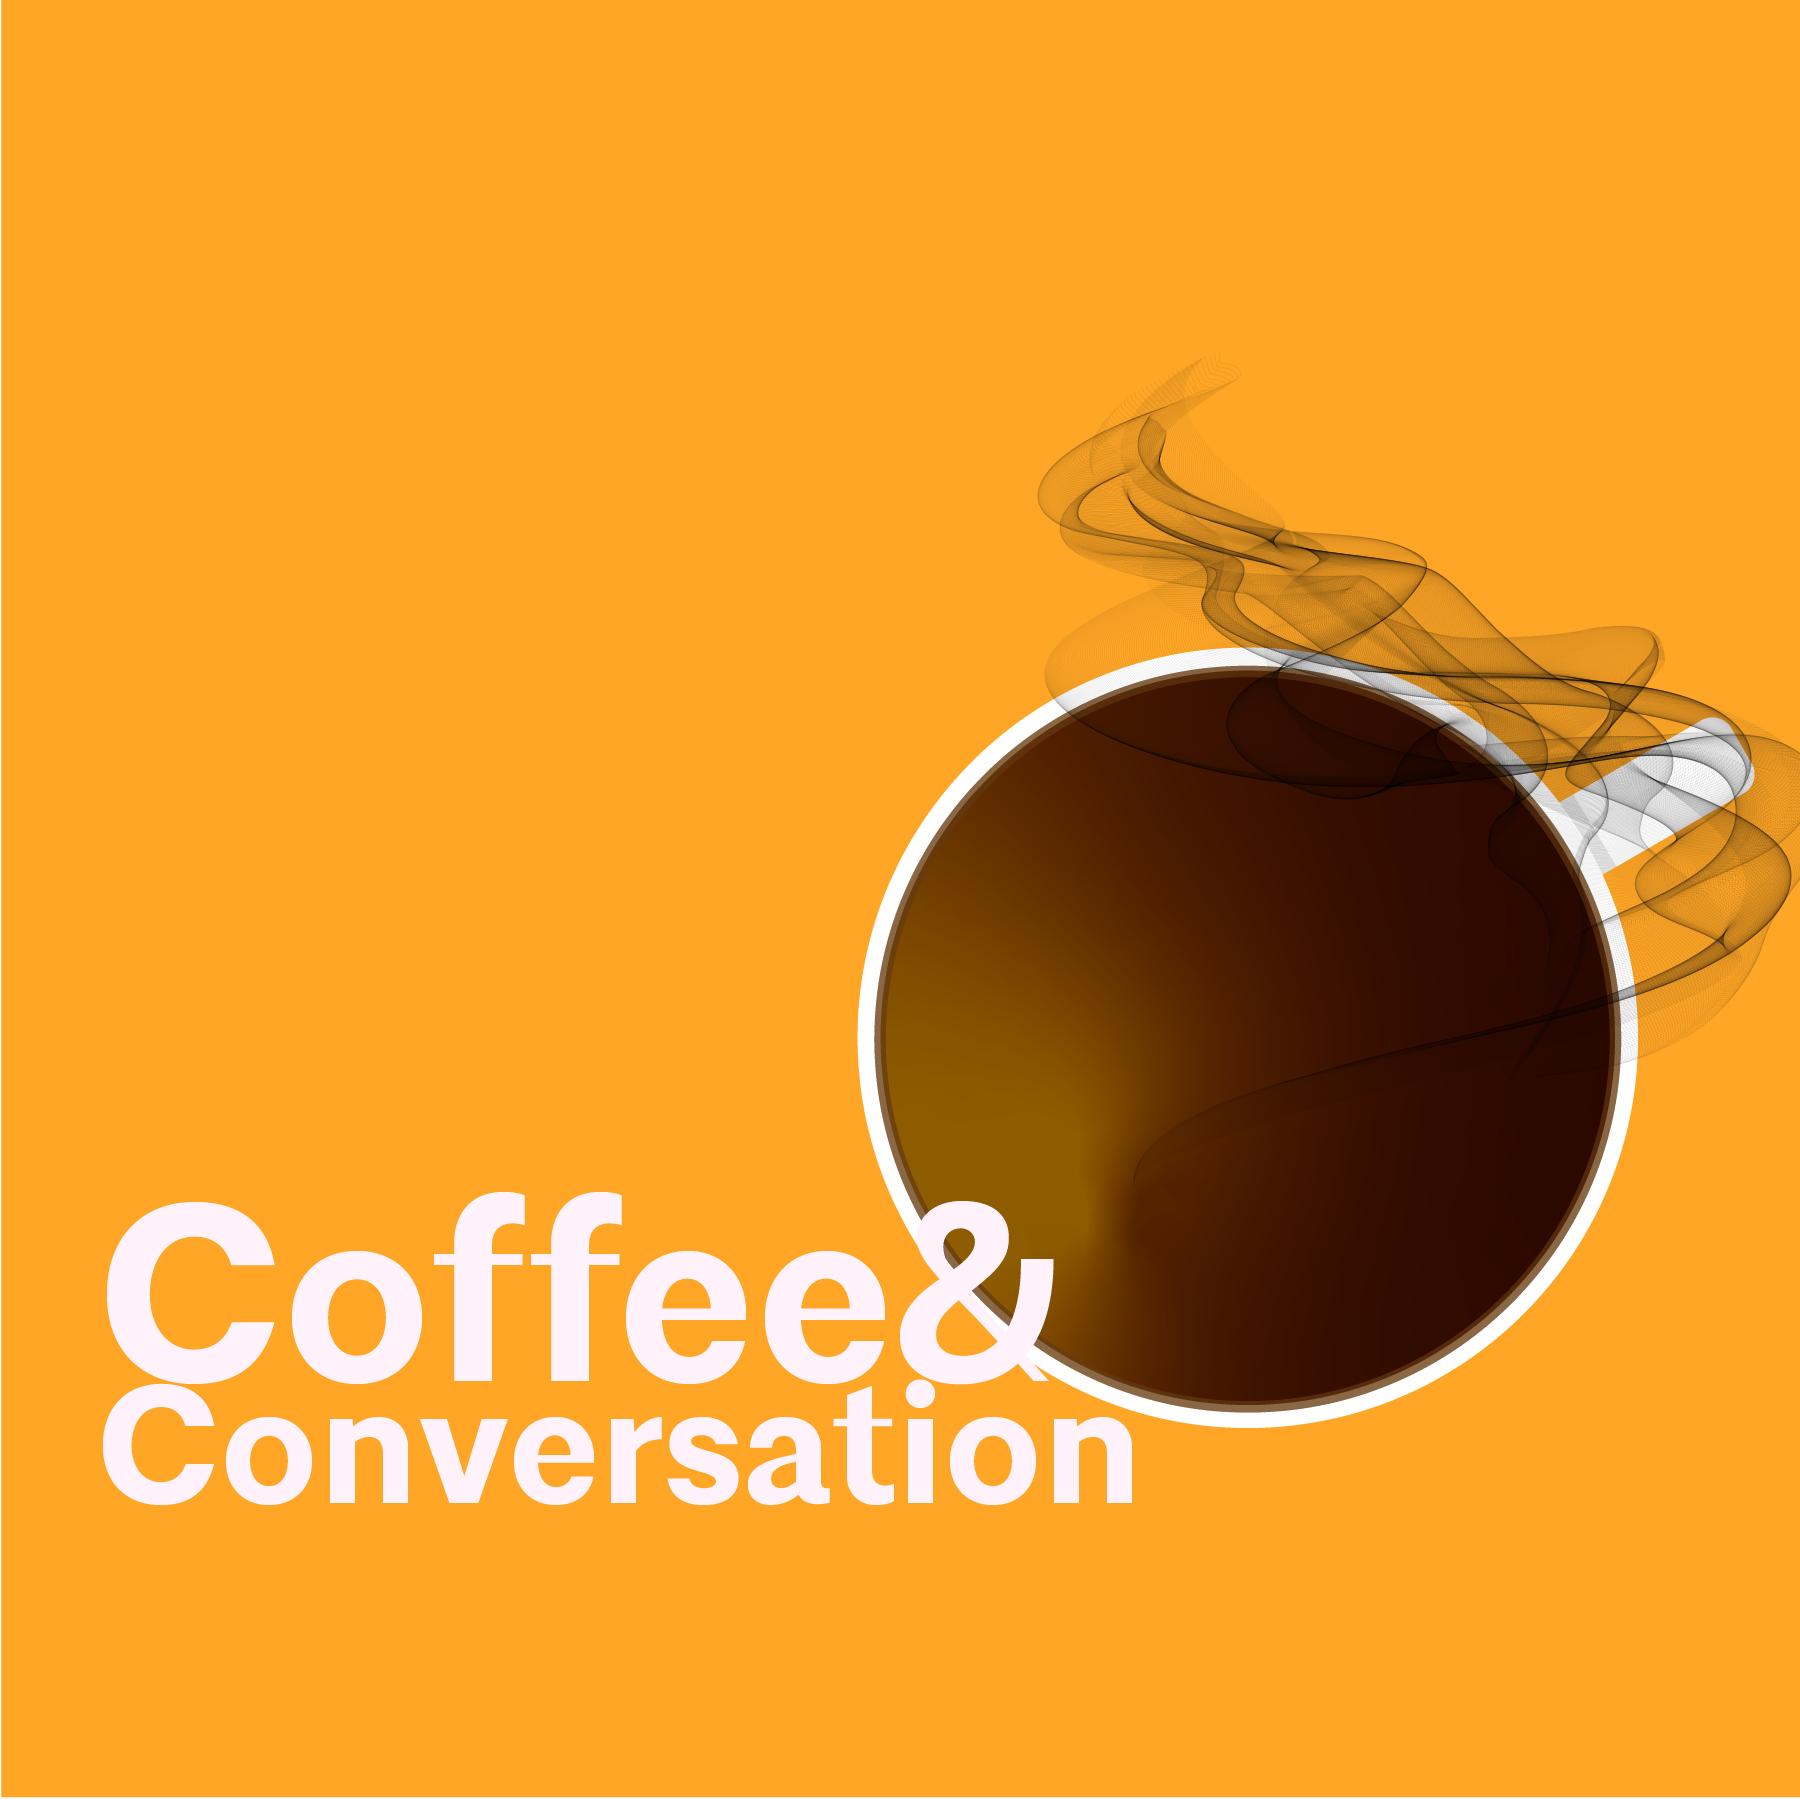 HYBRID Coffee & Conversation